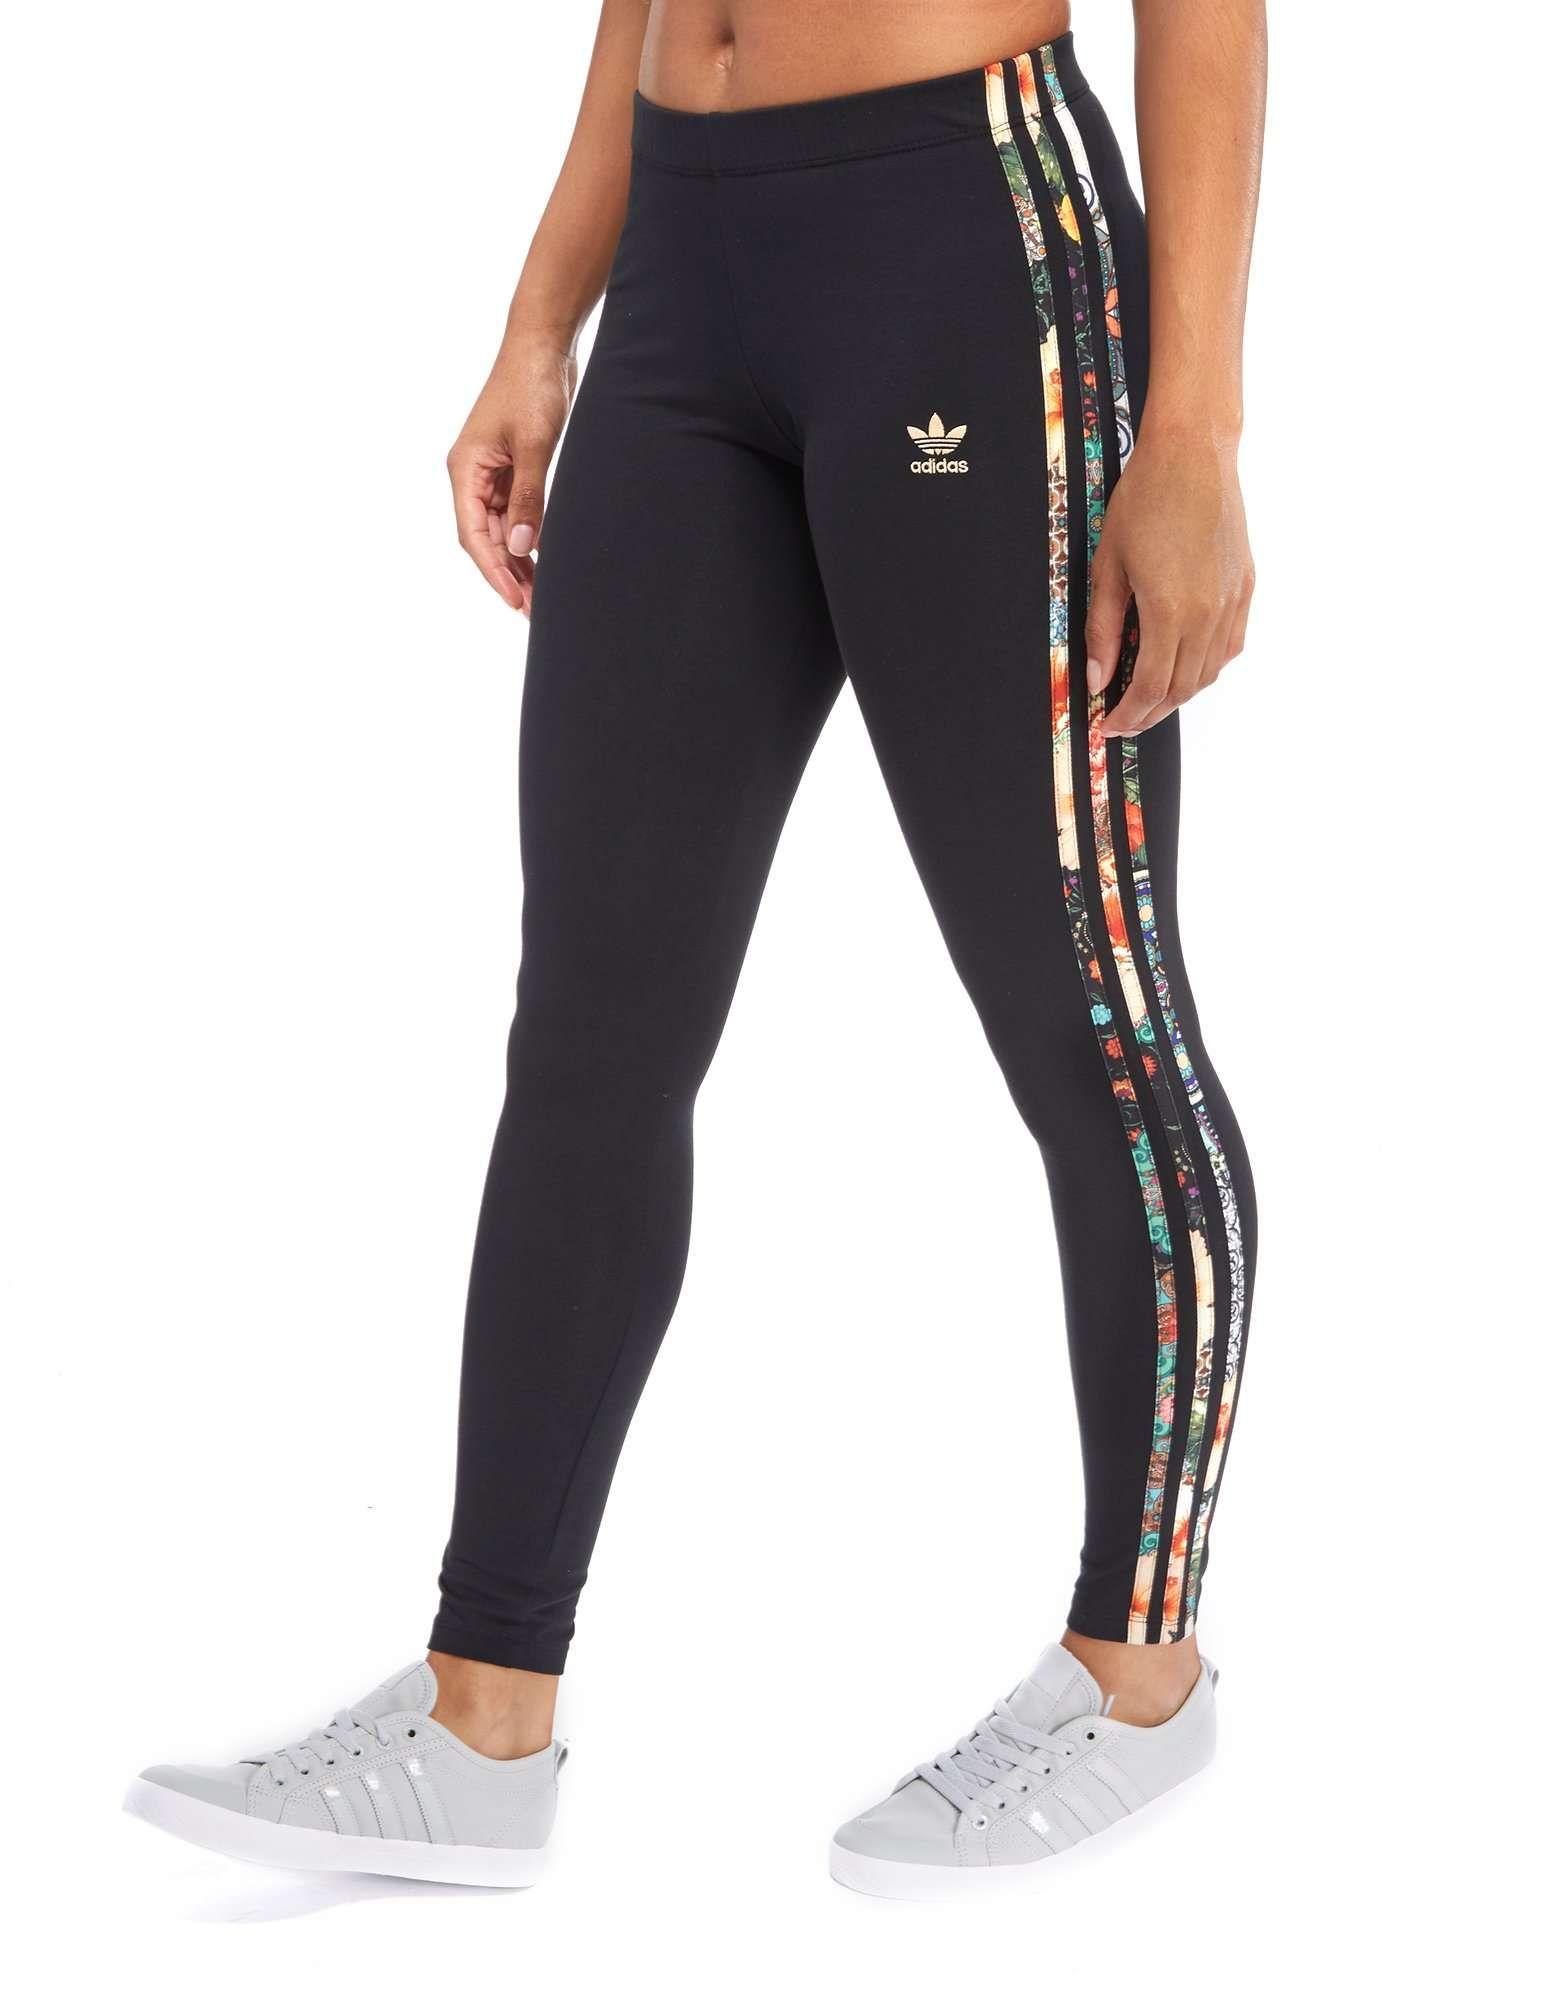 Adidas Originals 3 Stripes Leggings casa Pack JD Sports saludable